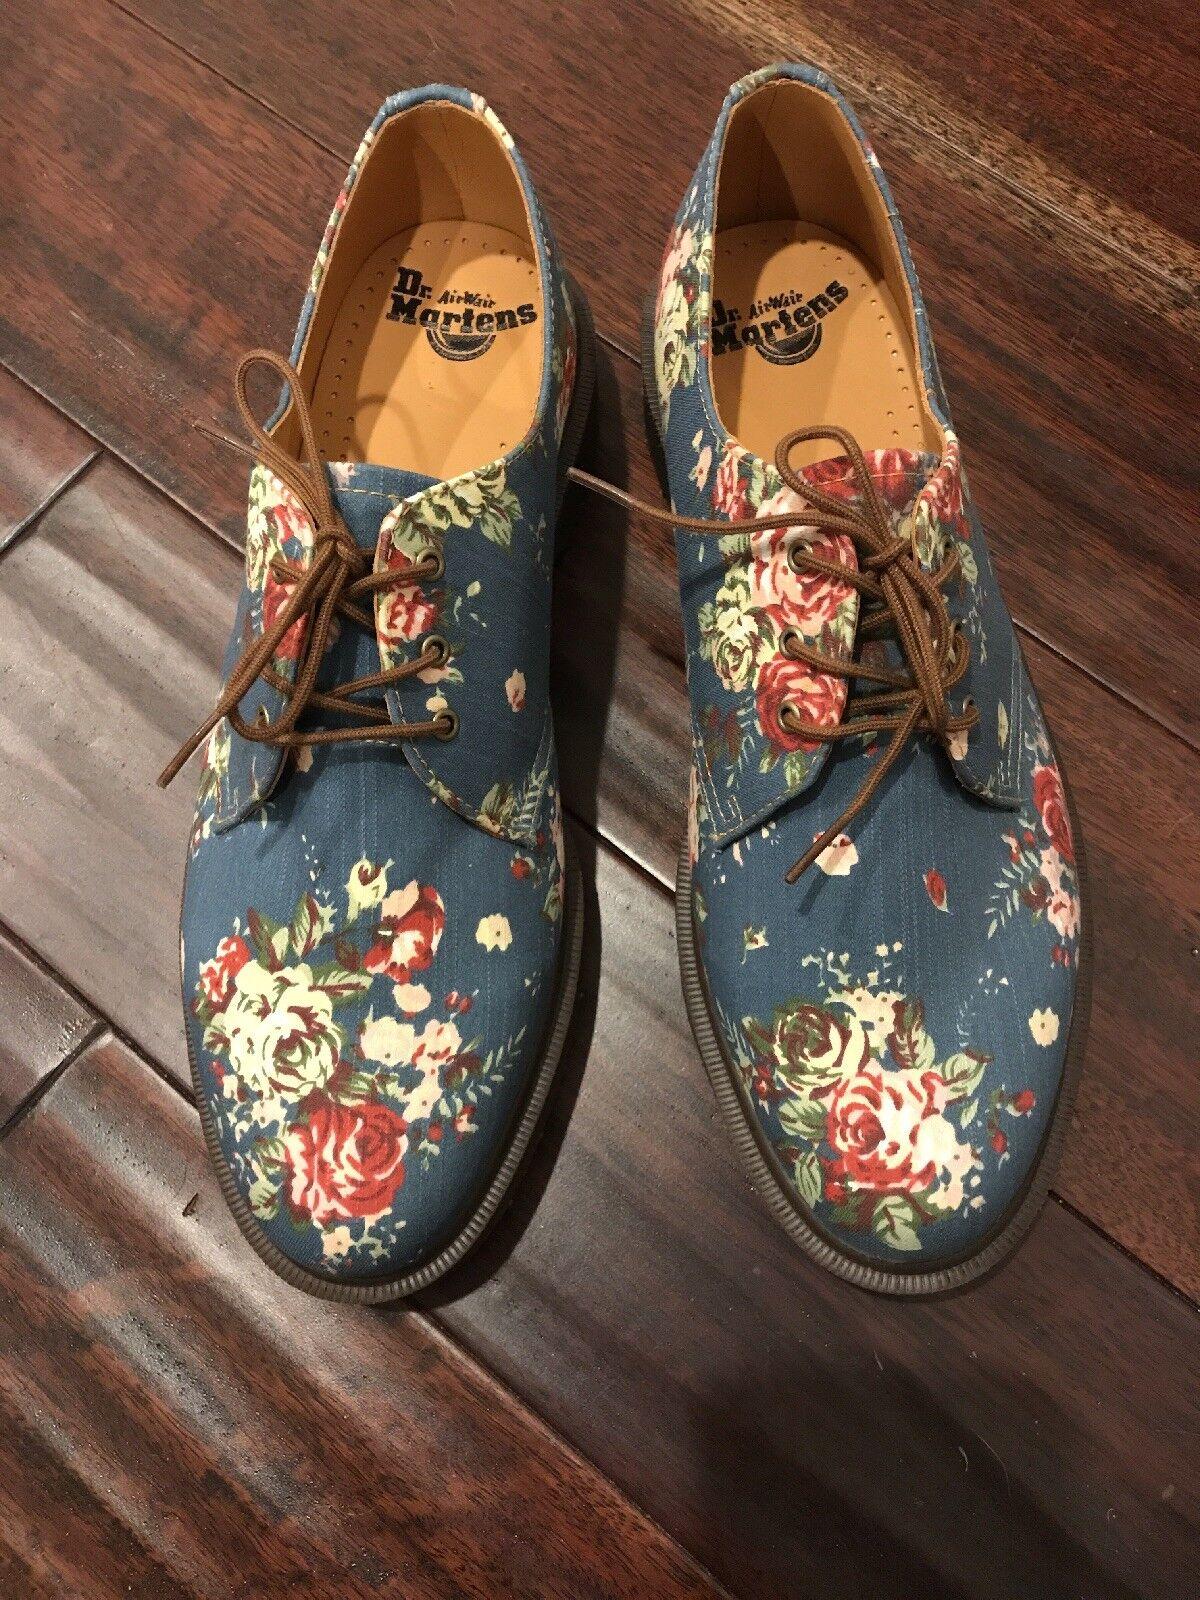 Steve Madden Womens WYNWOOD Open Toe Casual Platform Platform Casual Sandals, NATURAL, Size 11.0 aadd1a